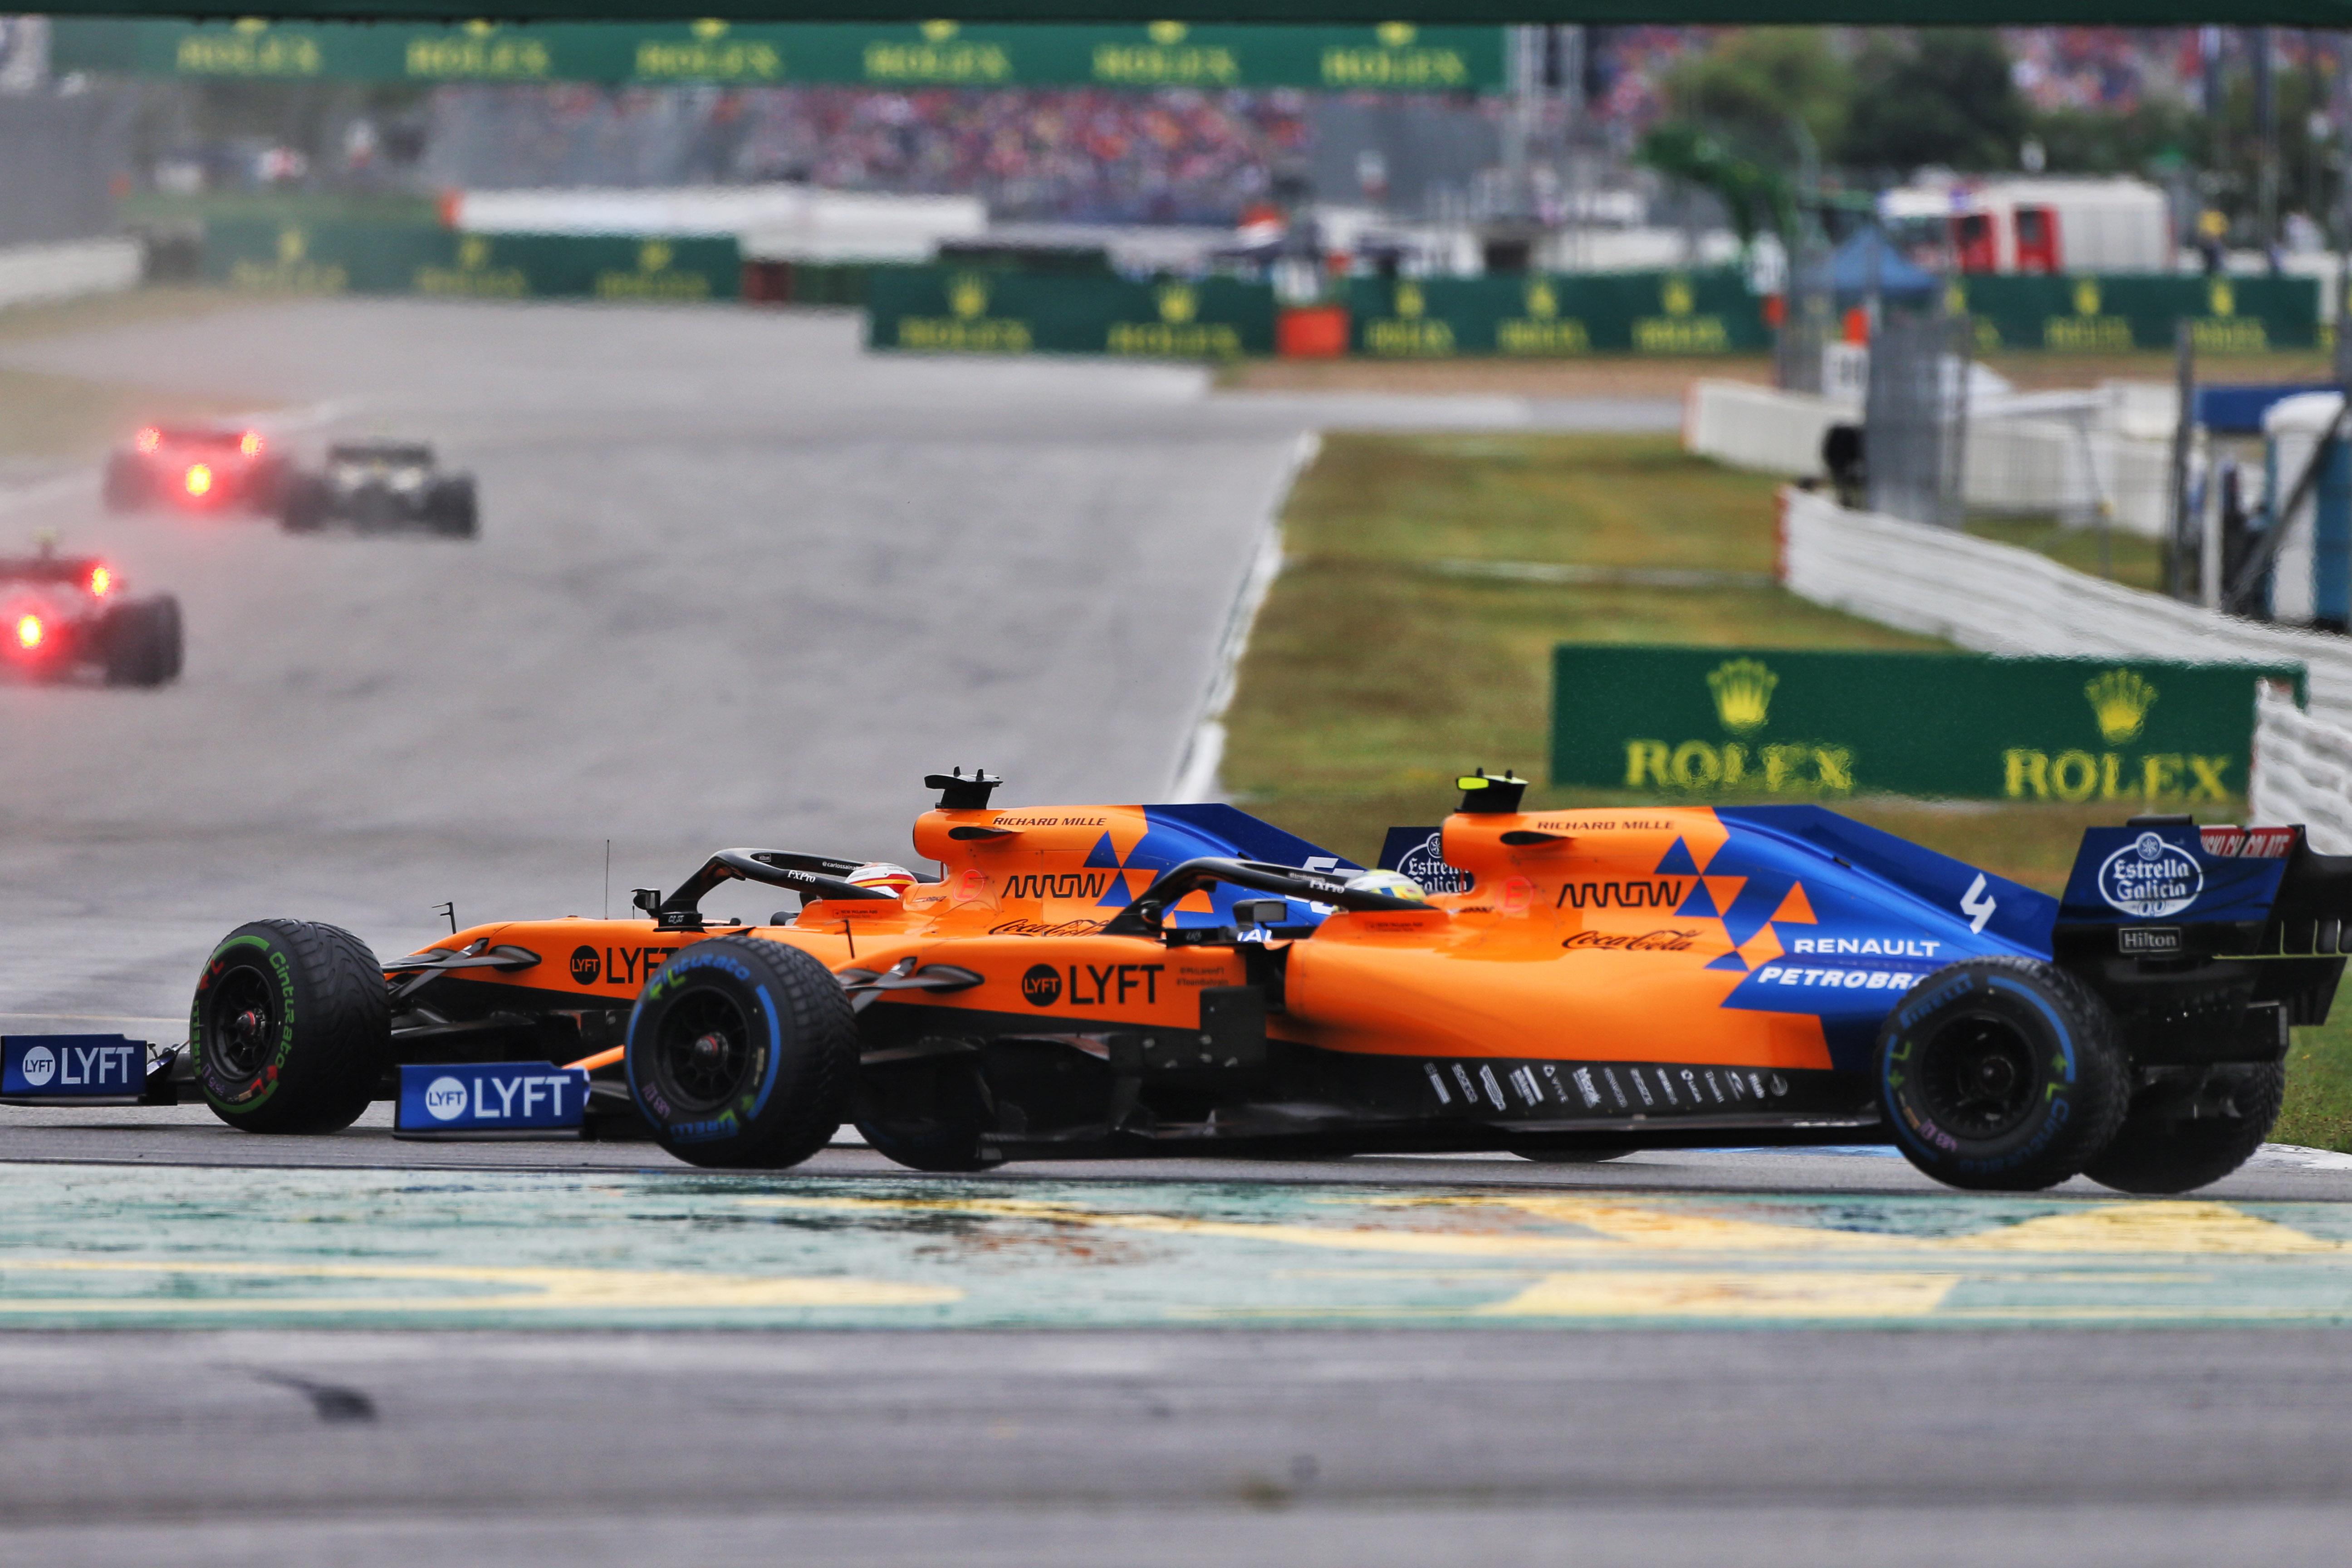 Motor Racing Formula One World Championship German Grand Prix Race Day Hockenheim, Germany